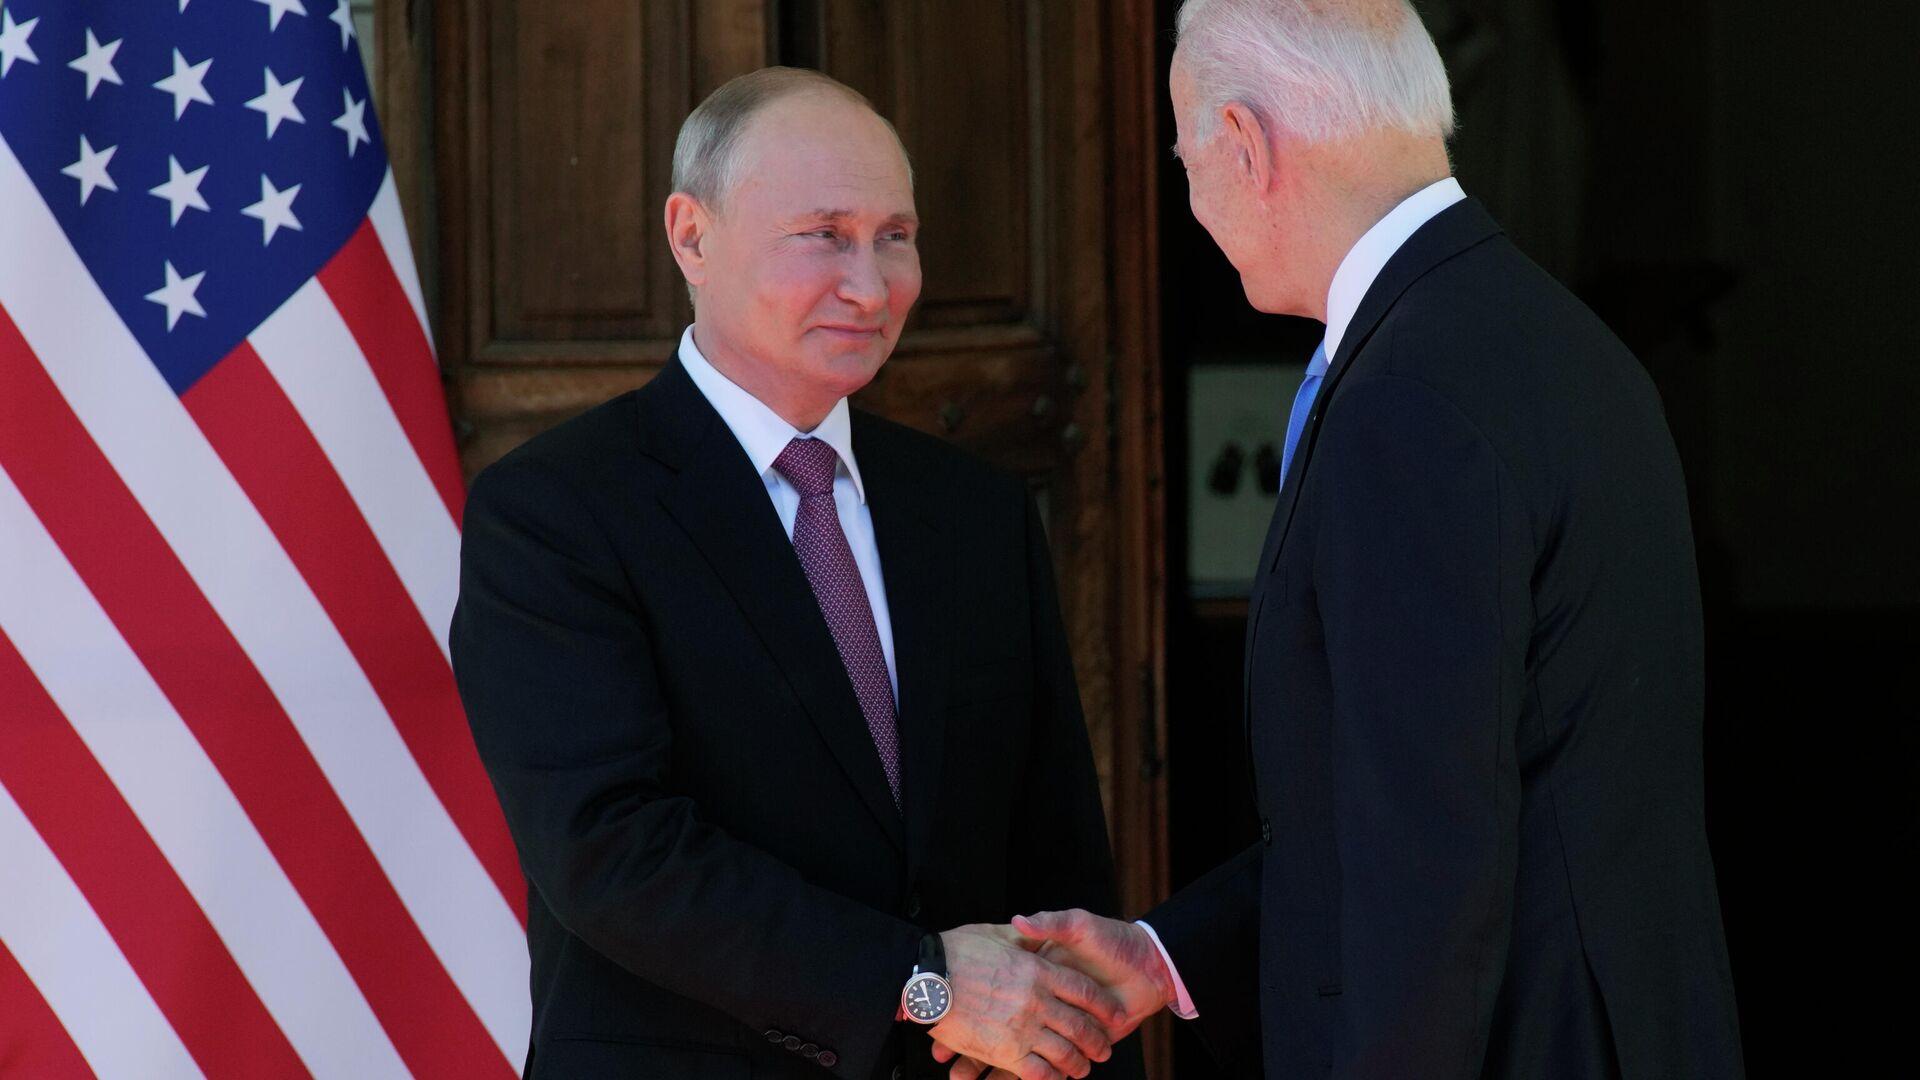 Рукопожатие президента России Владимира Путина и президента США Джо Байдена - Sputnik Таджикистан, 1920, 09.09.2021